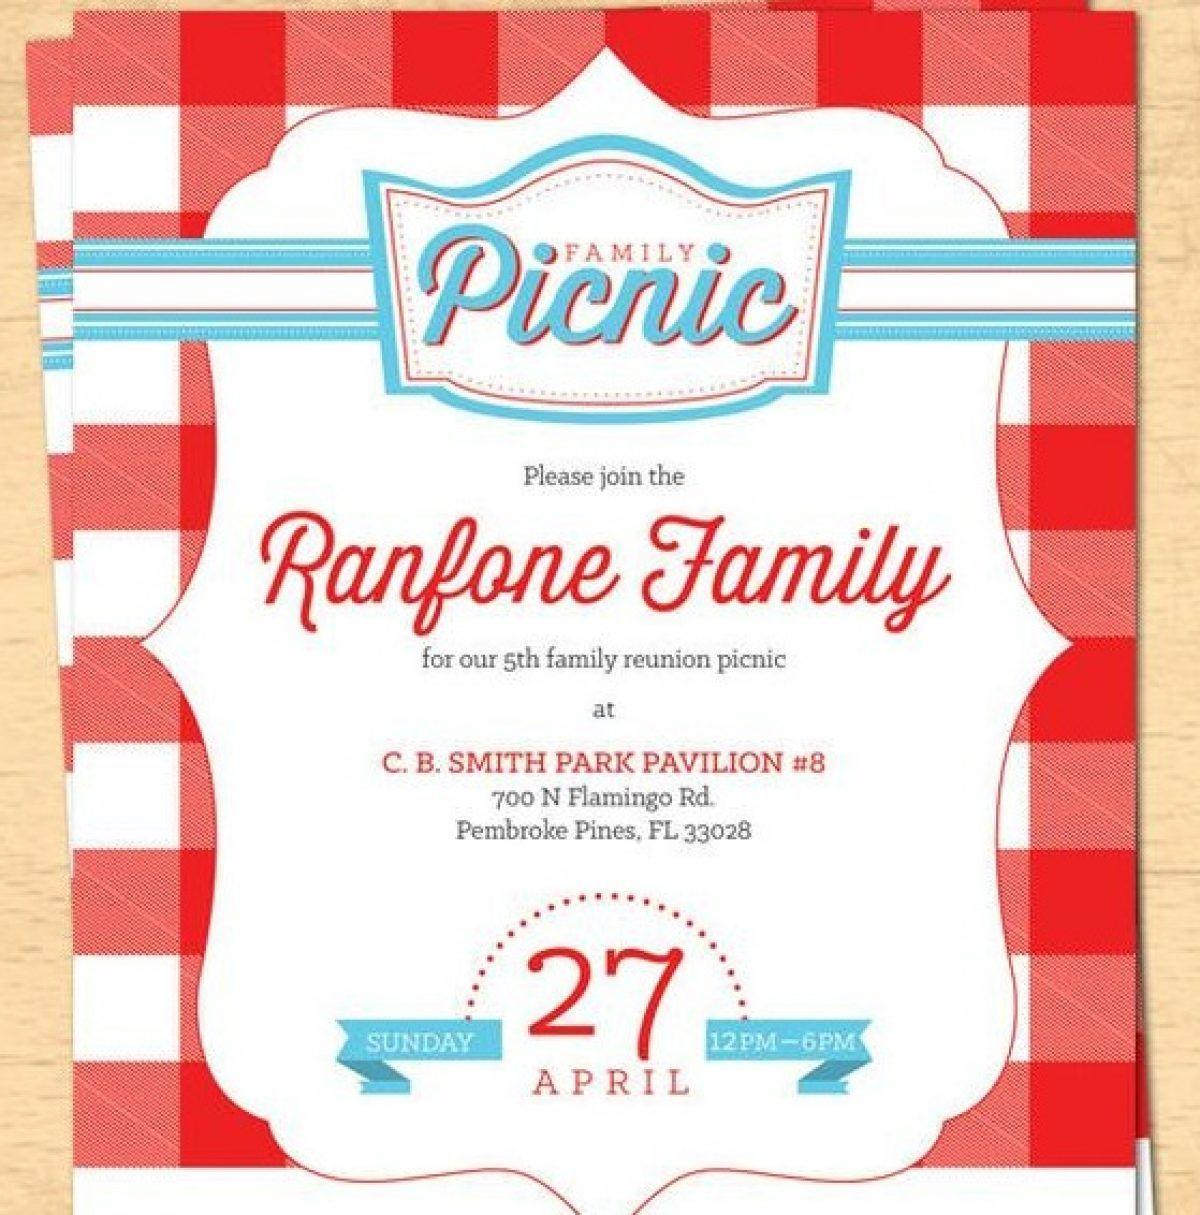 007 Wondrou Family Reunion Flyer Template Free Inspiration  Downloadable Printable InvitationFull